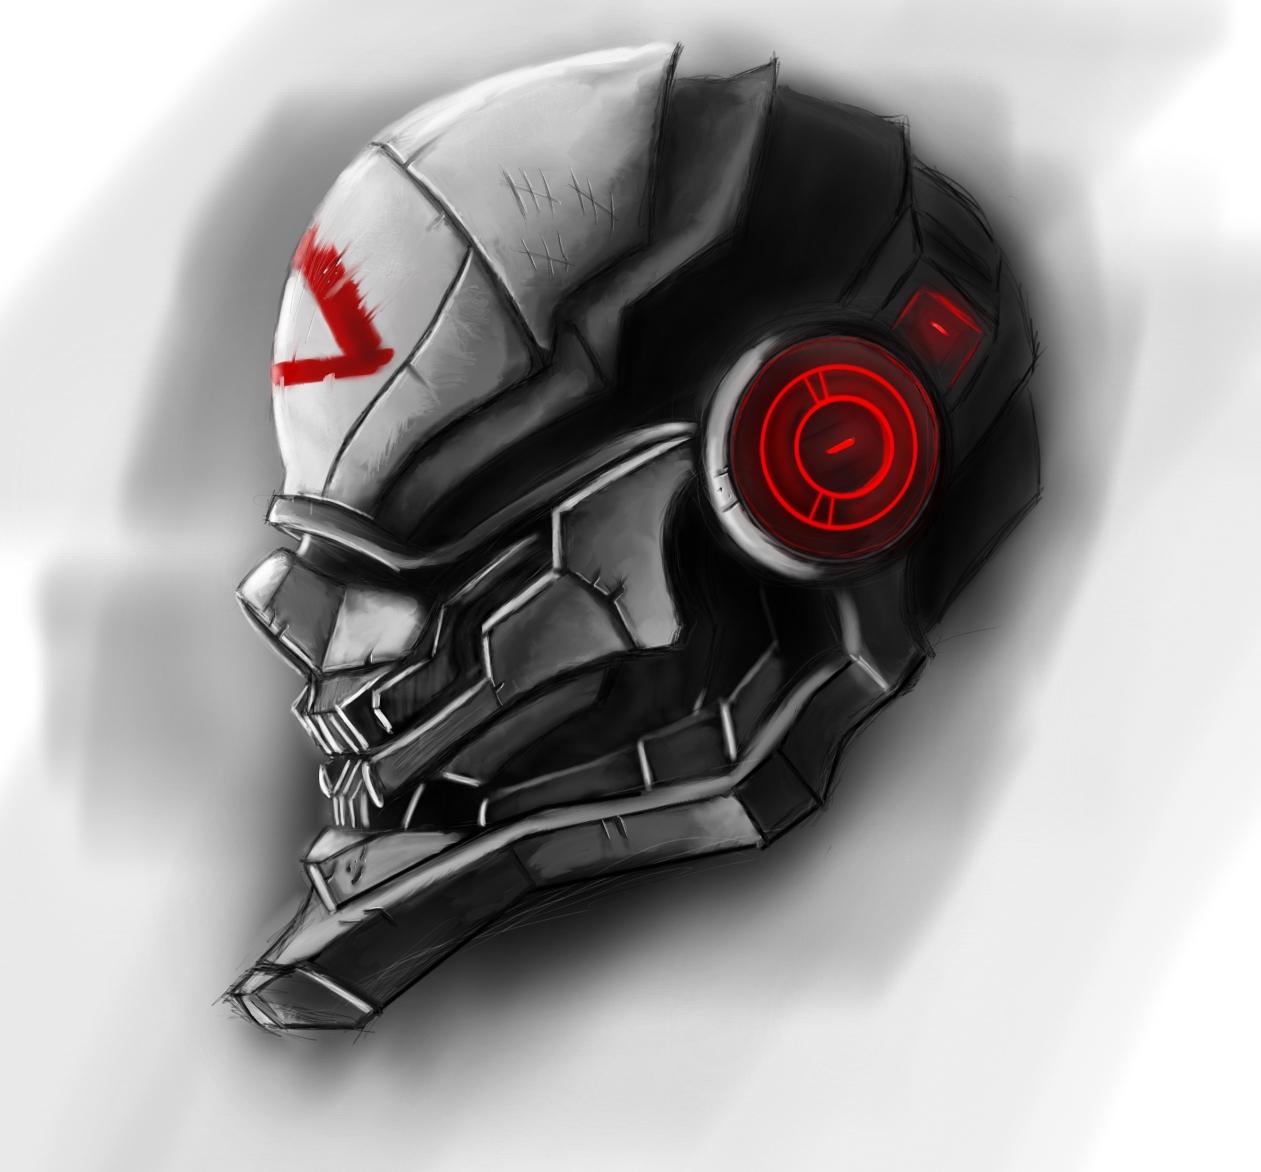 Pictures of Sci Fi Helmet Design - #rock-cafe